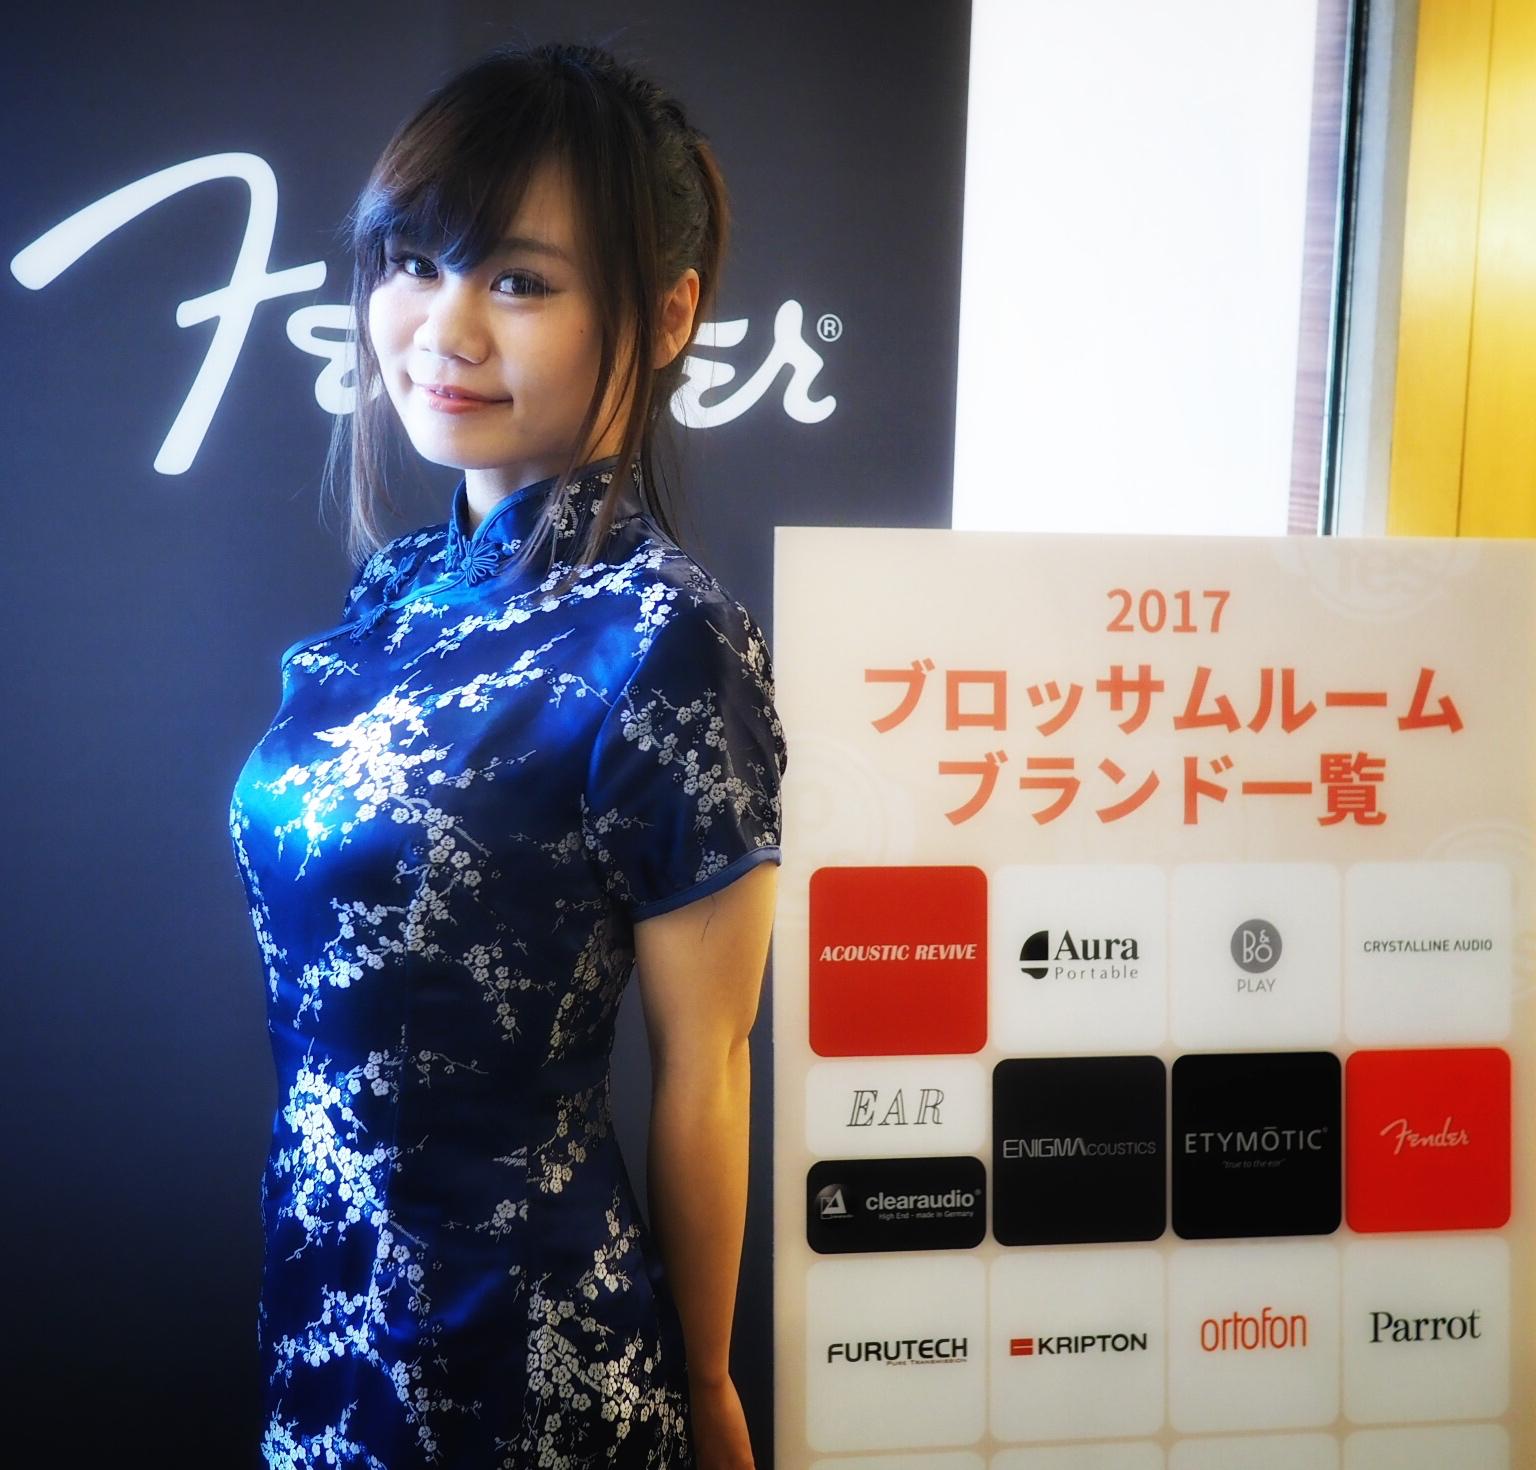 Photo 2017-04-29 15 13 44.jpg